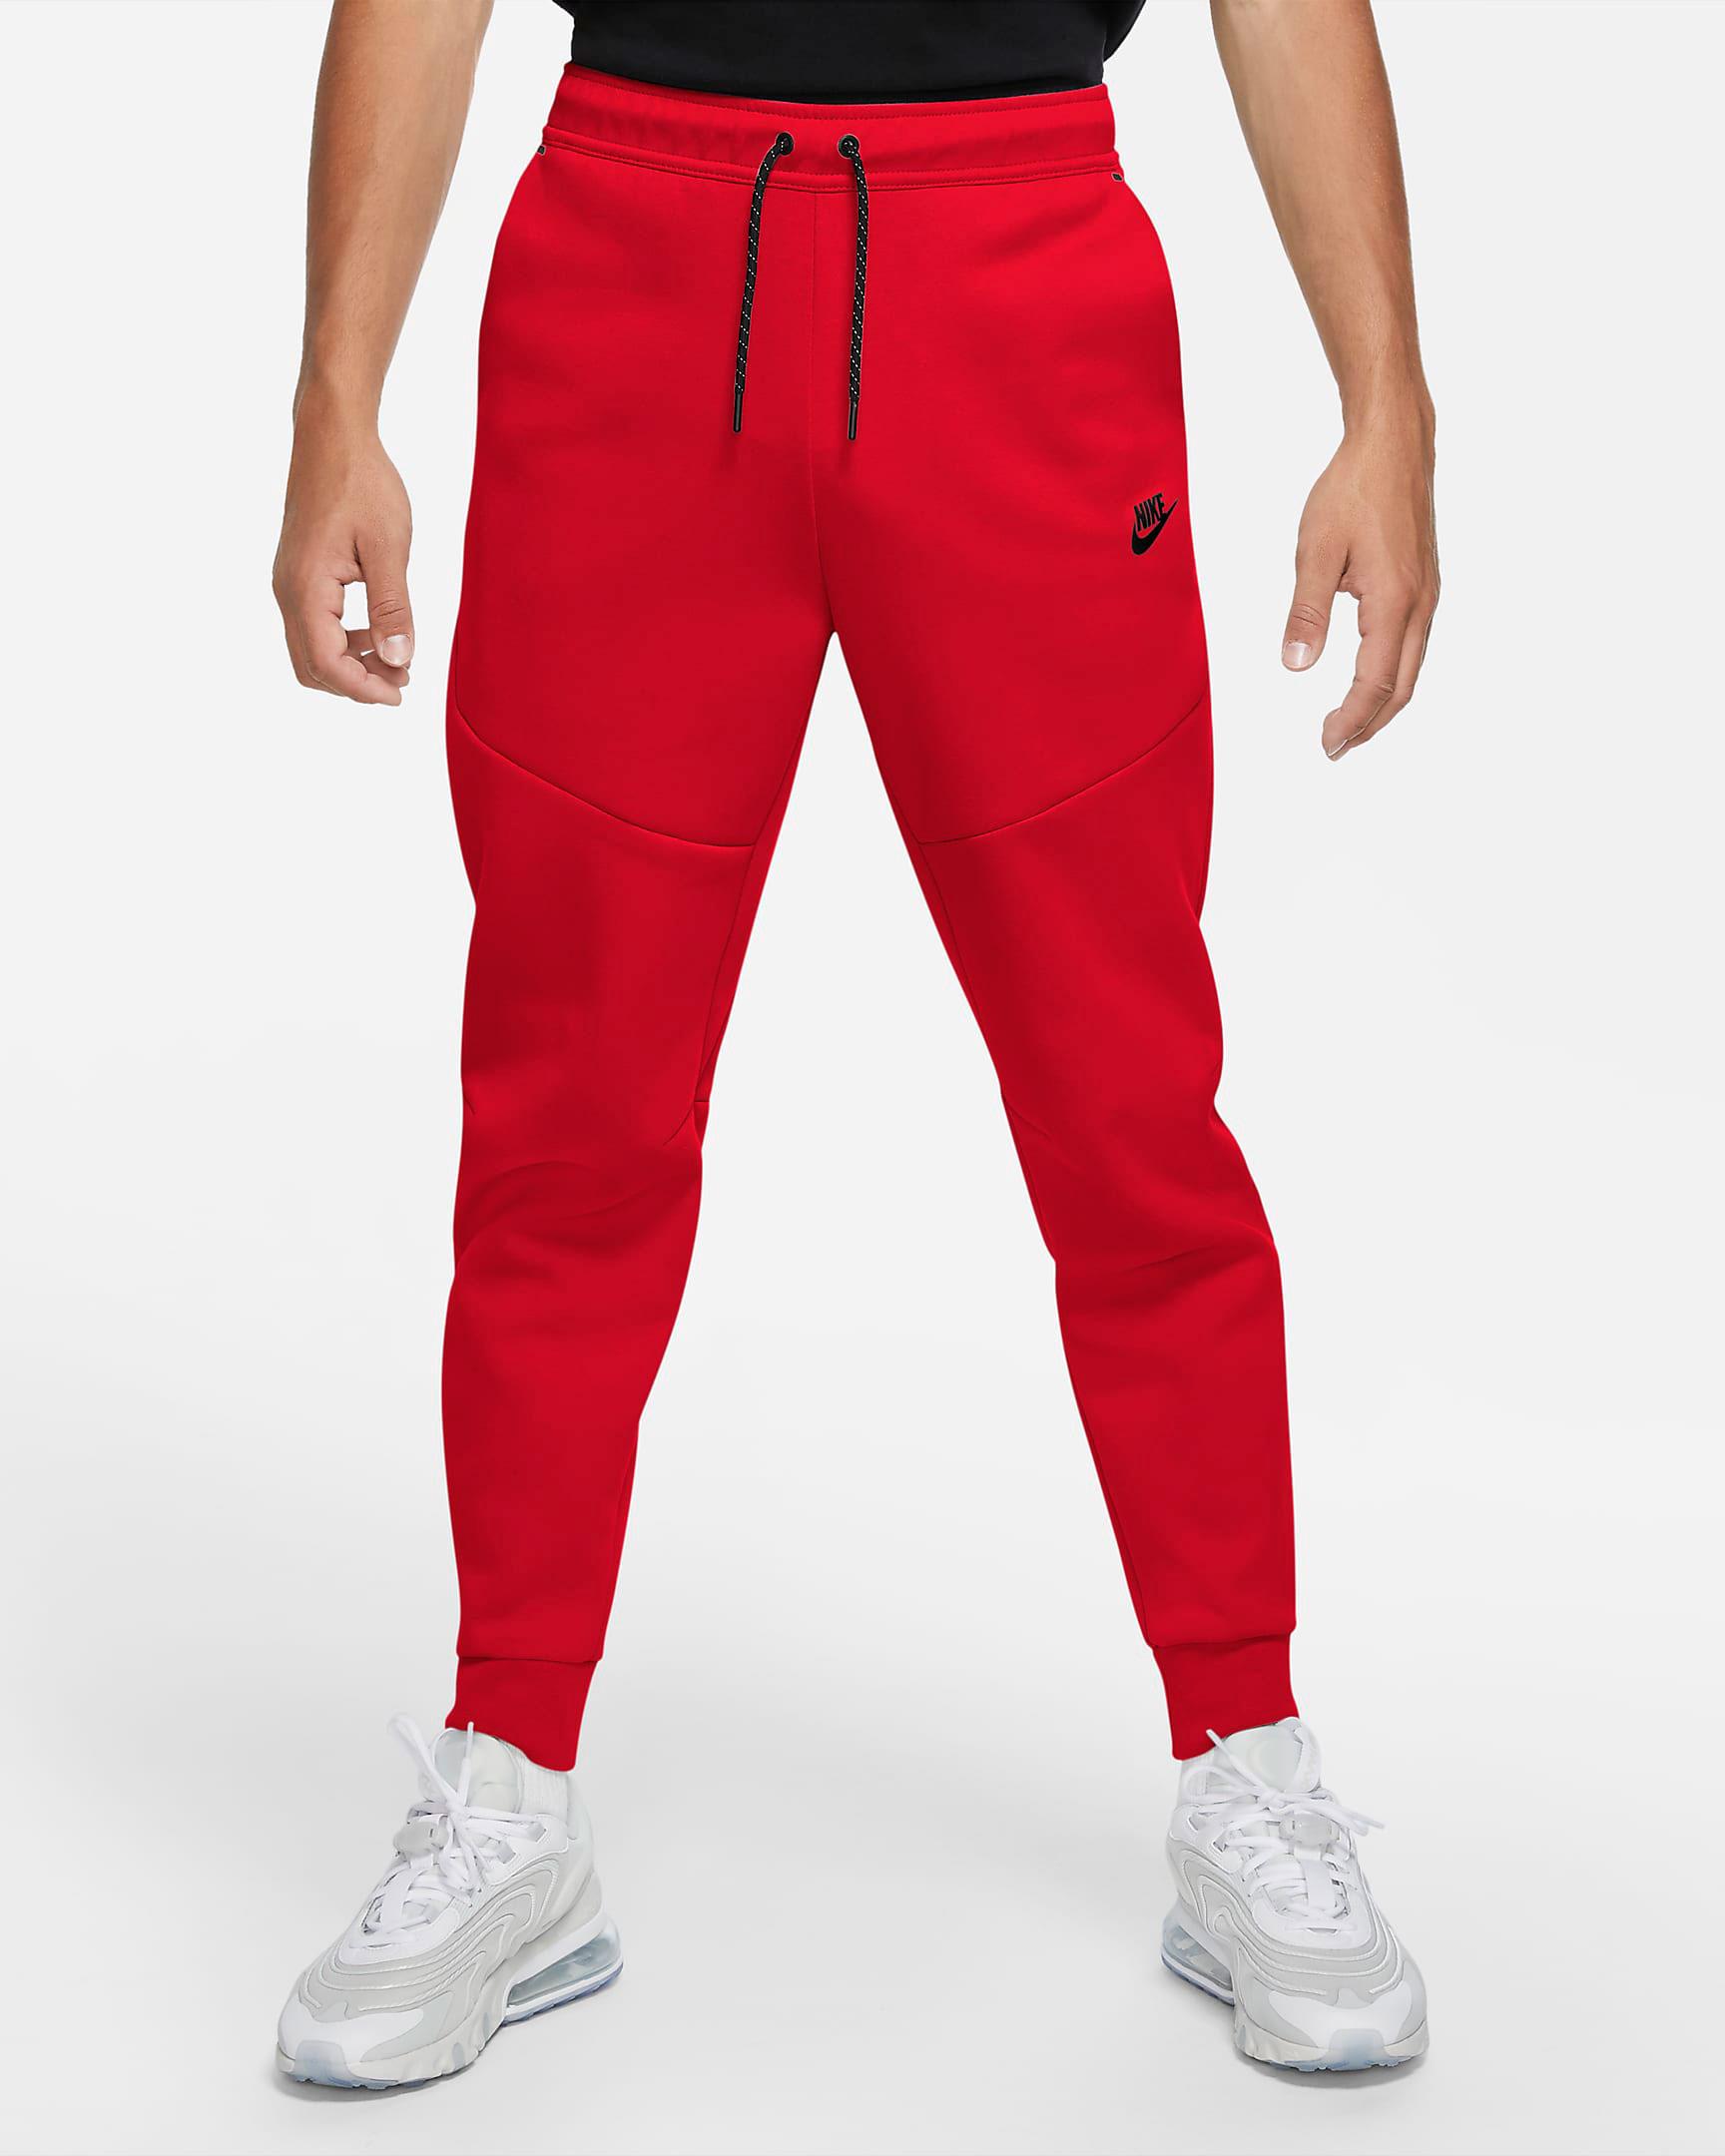 air-jordan-4-fire-red-nike-air-pants